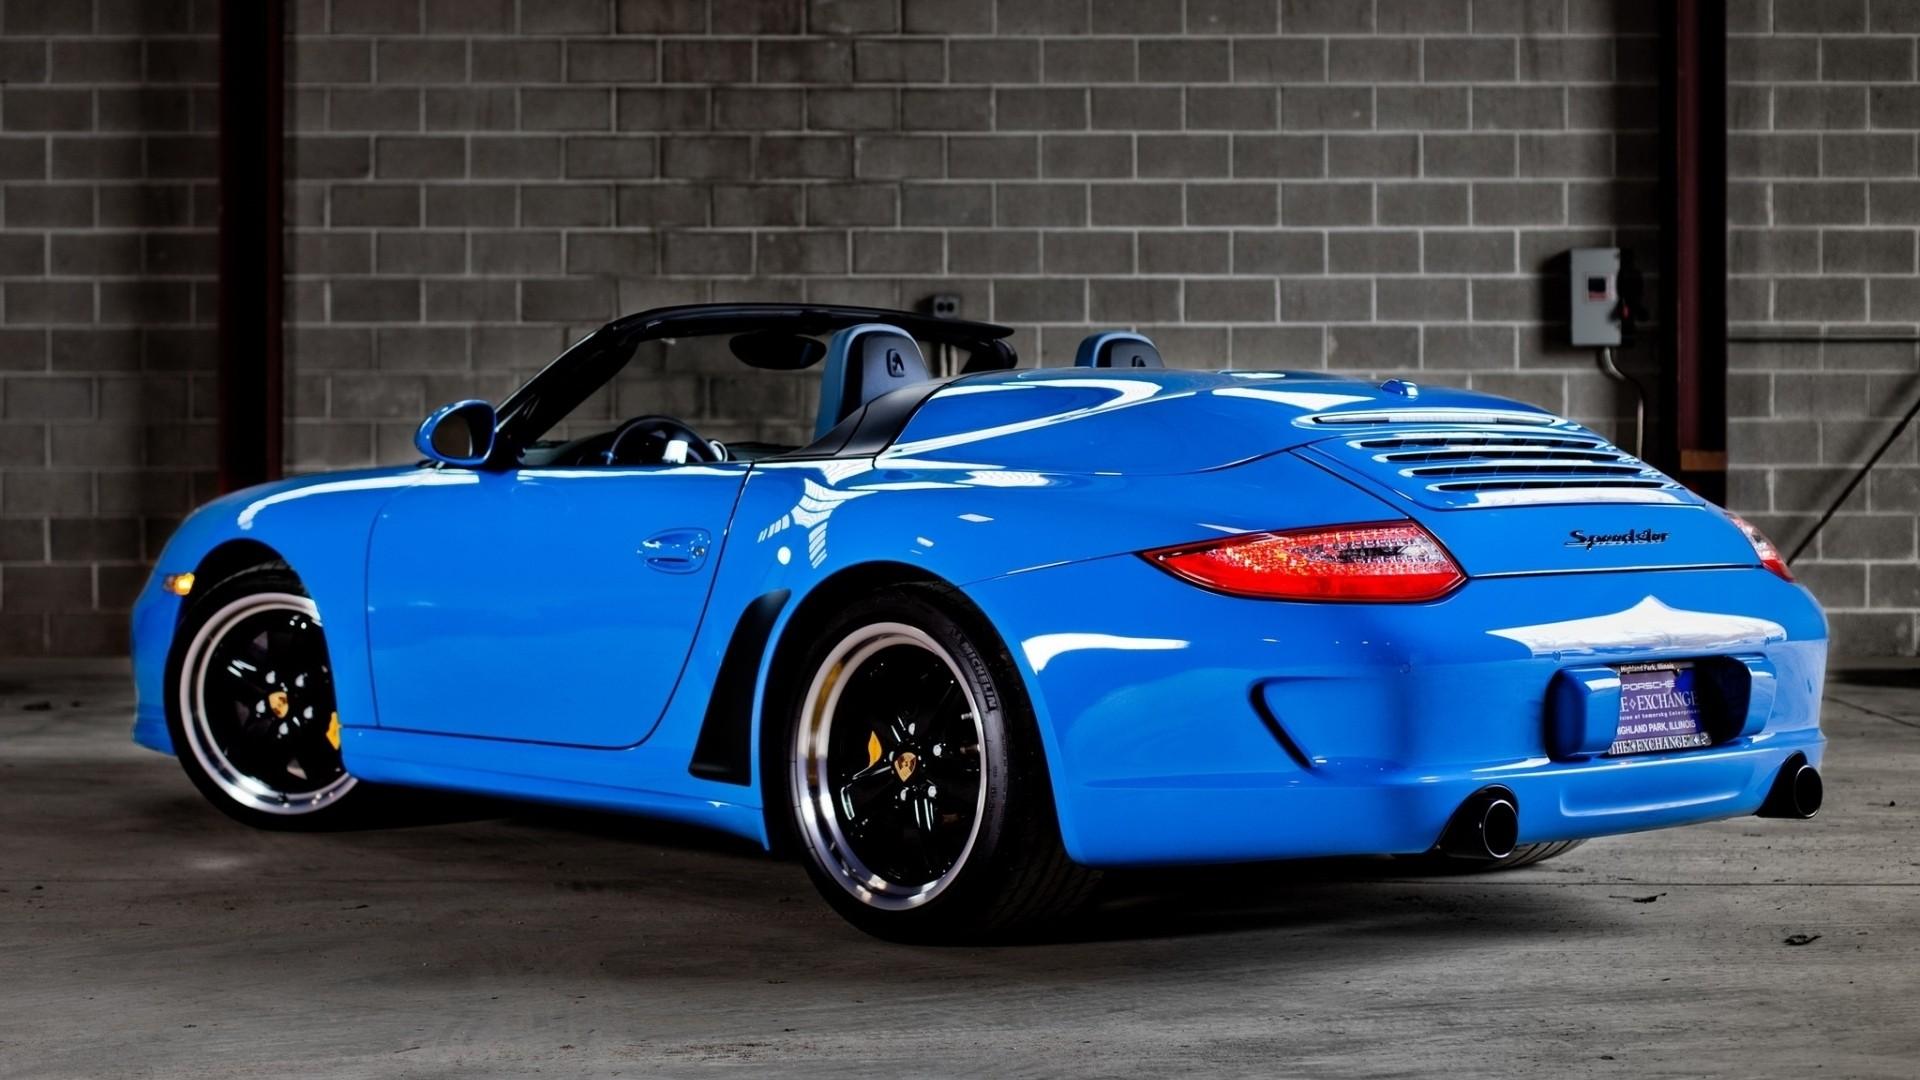 Porsche Speedster 2012 HD 1080p Wallpapers Download HD Wallpapers 1920x1080